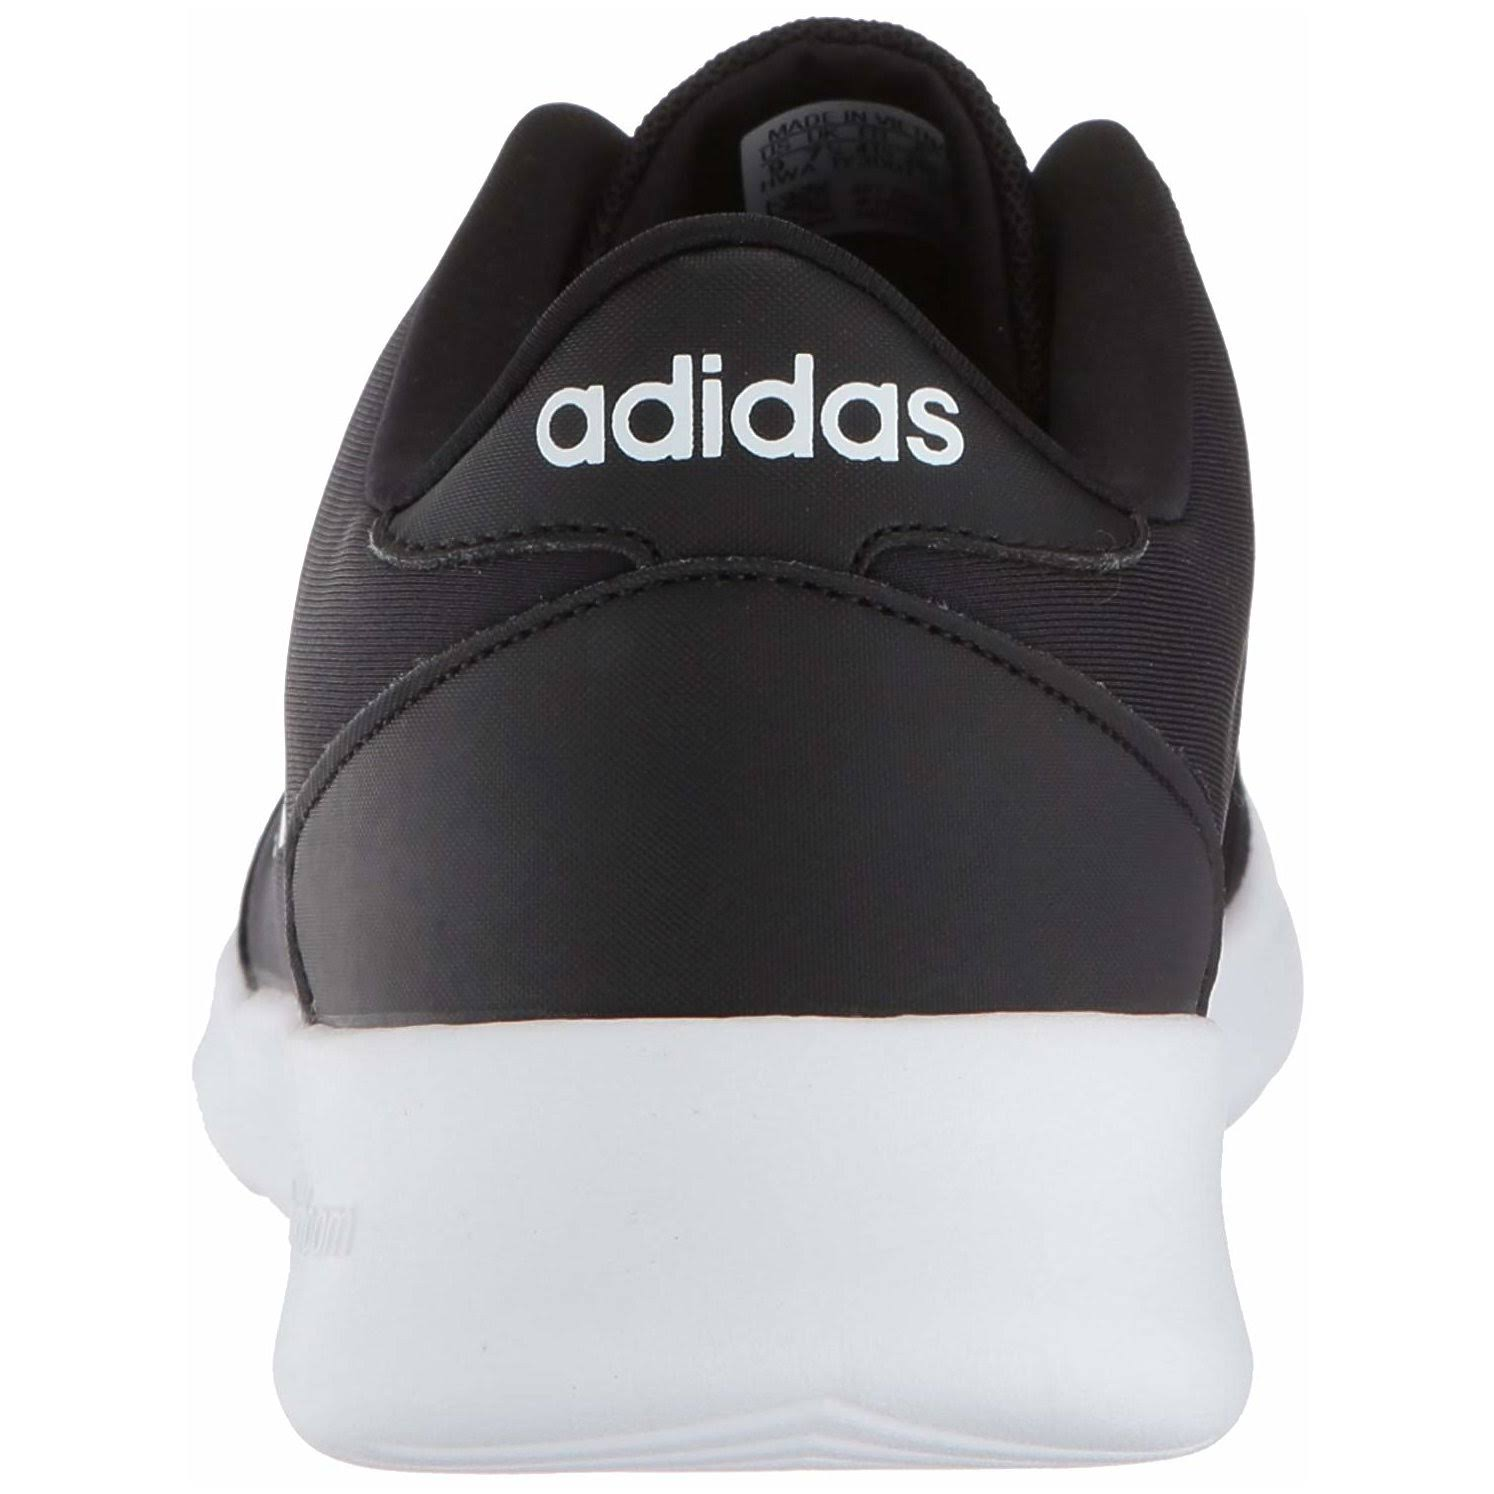 Qt Cloudfoam damessneakerszwartwit11 Cloudfoam Racer Adidas Adidas lFJ31cTK